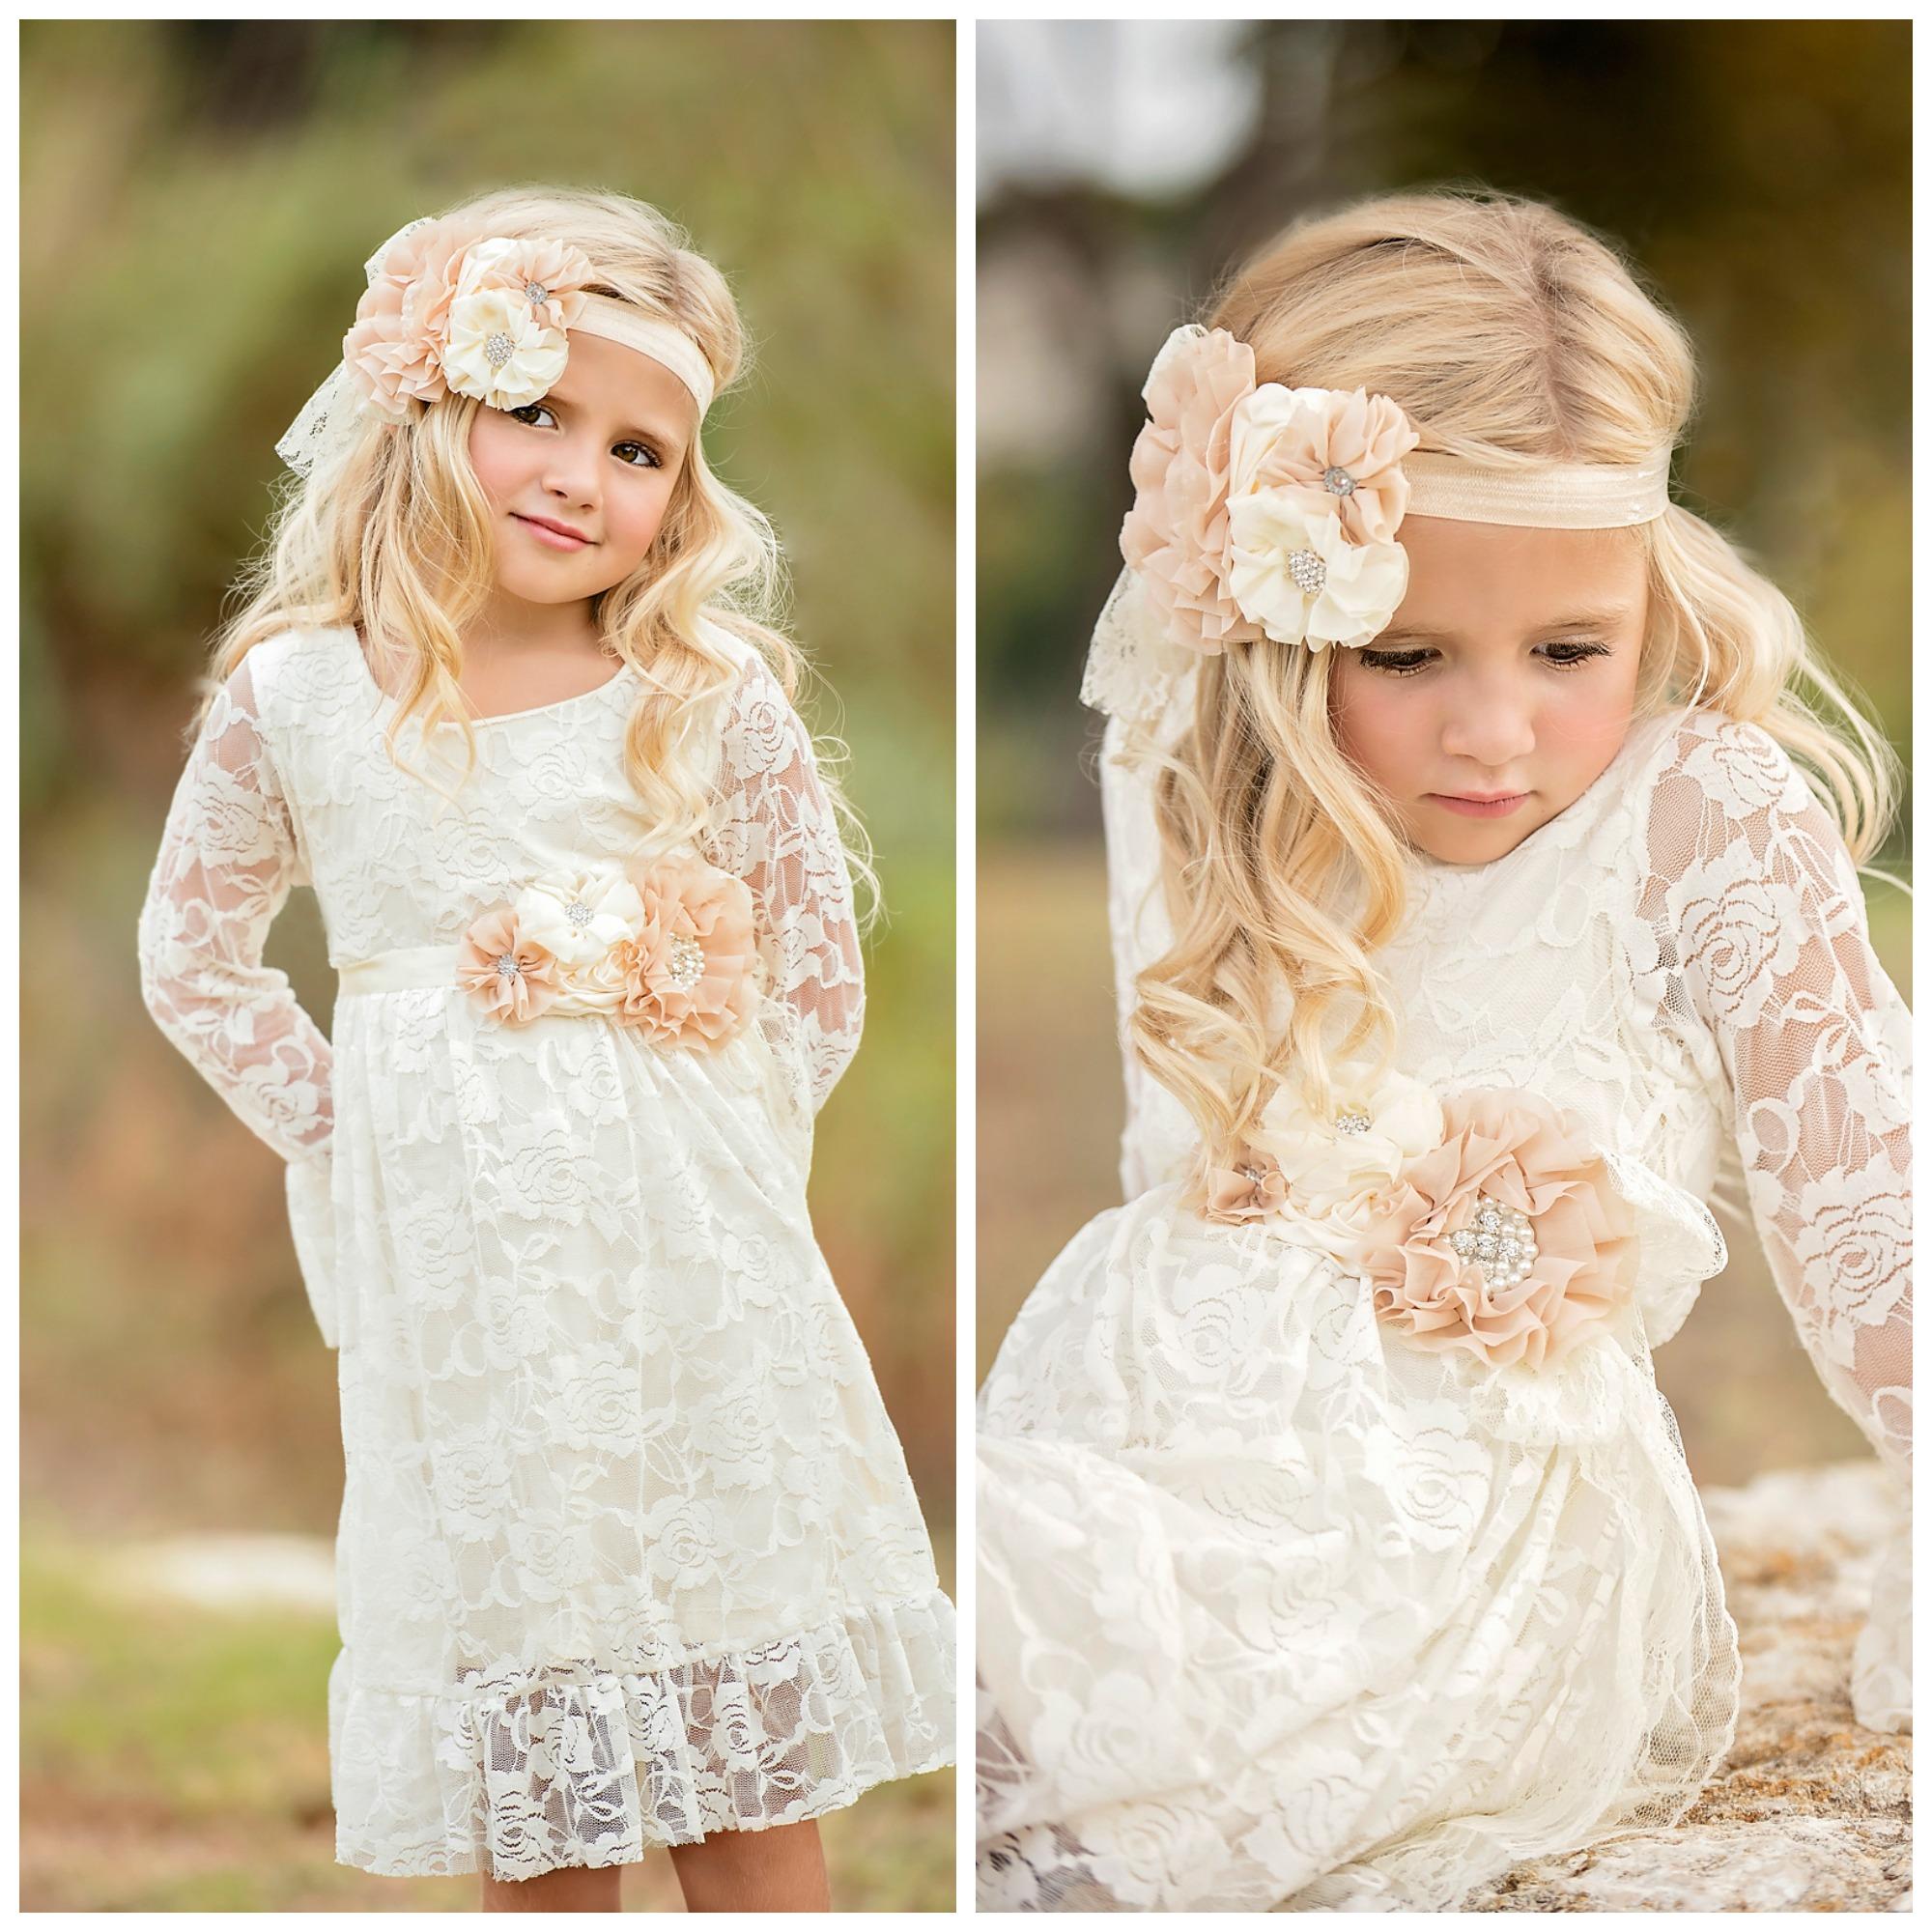 Rustic wedding flower girl dresses  Sweetheart Boho Chic Ivory Lace Dress Set  Little One  Pinterest